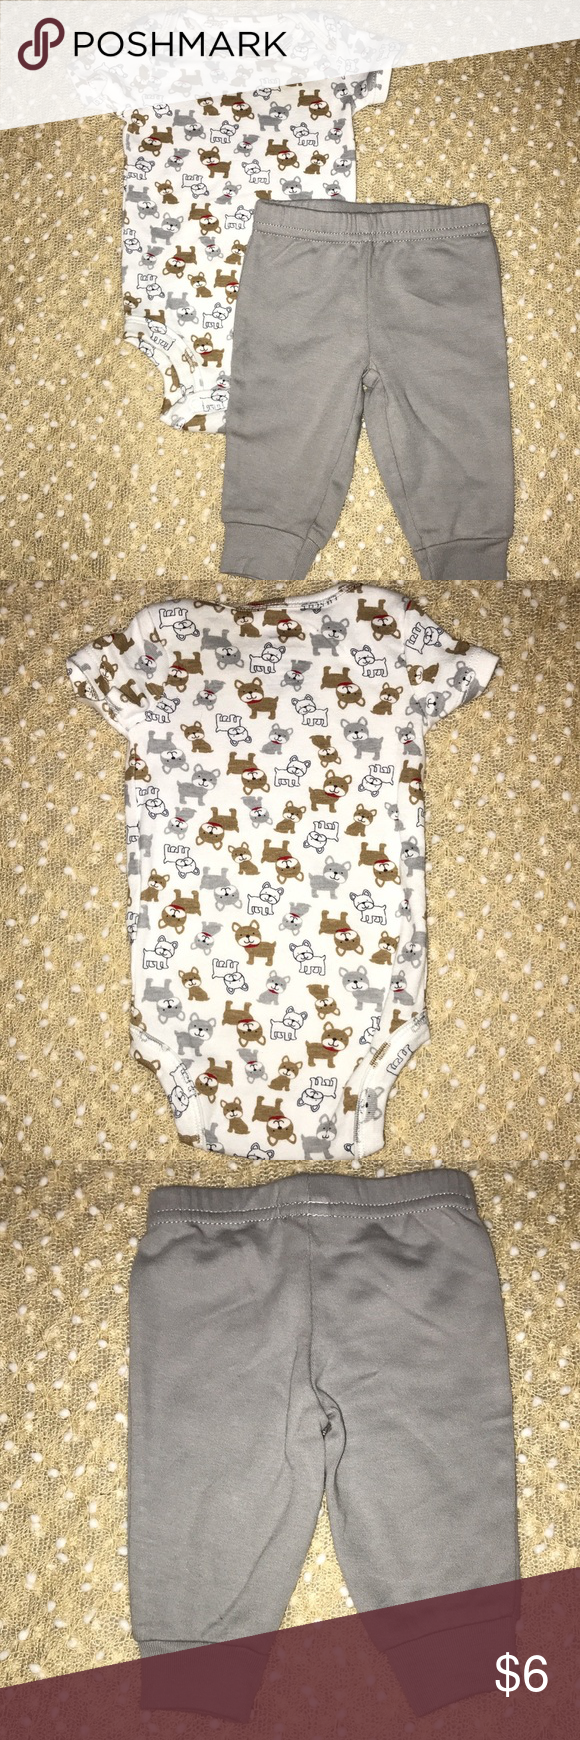 Puppy carterus outfit newborn smoke free smoking and shapes